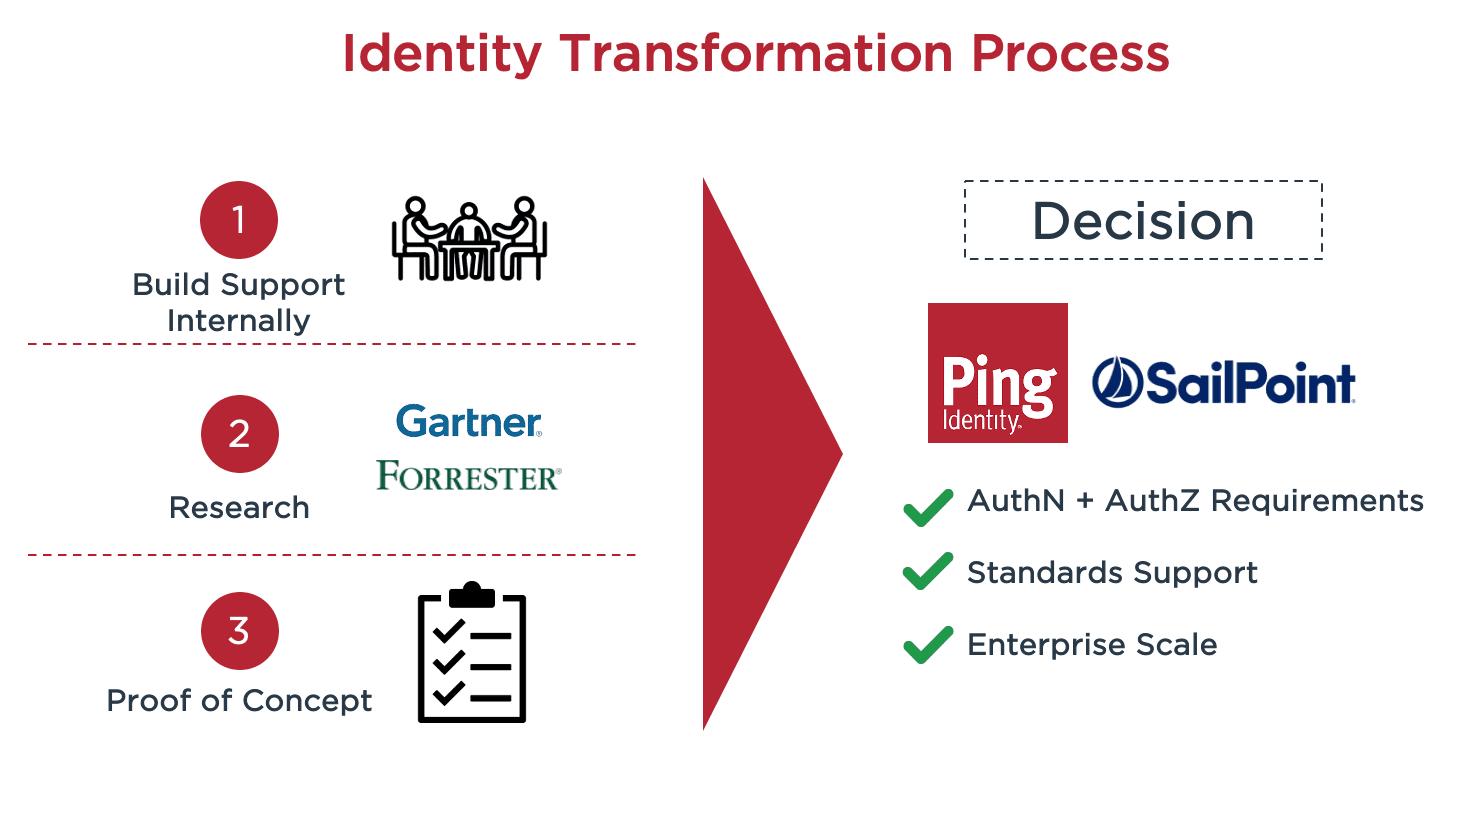 Identity transformation process diagram